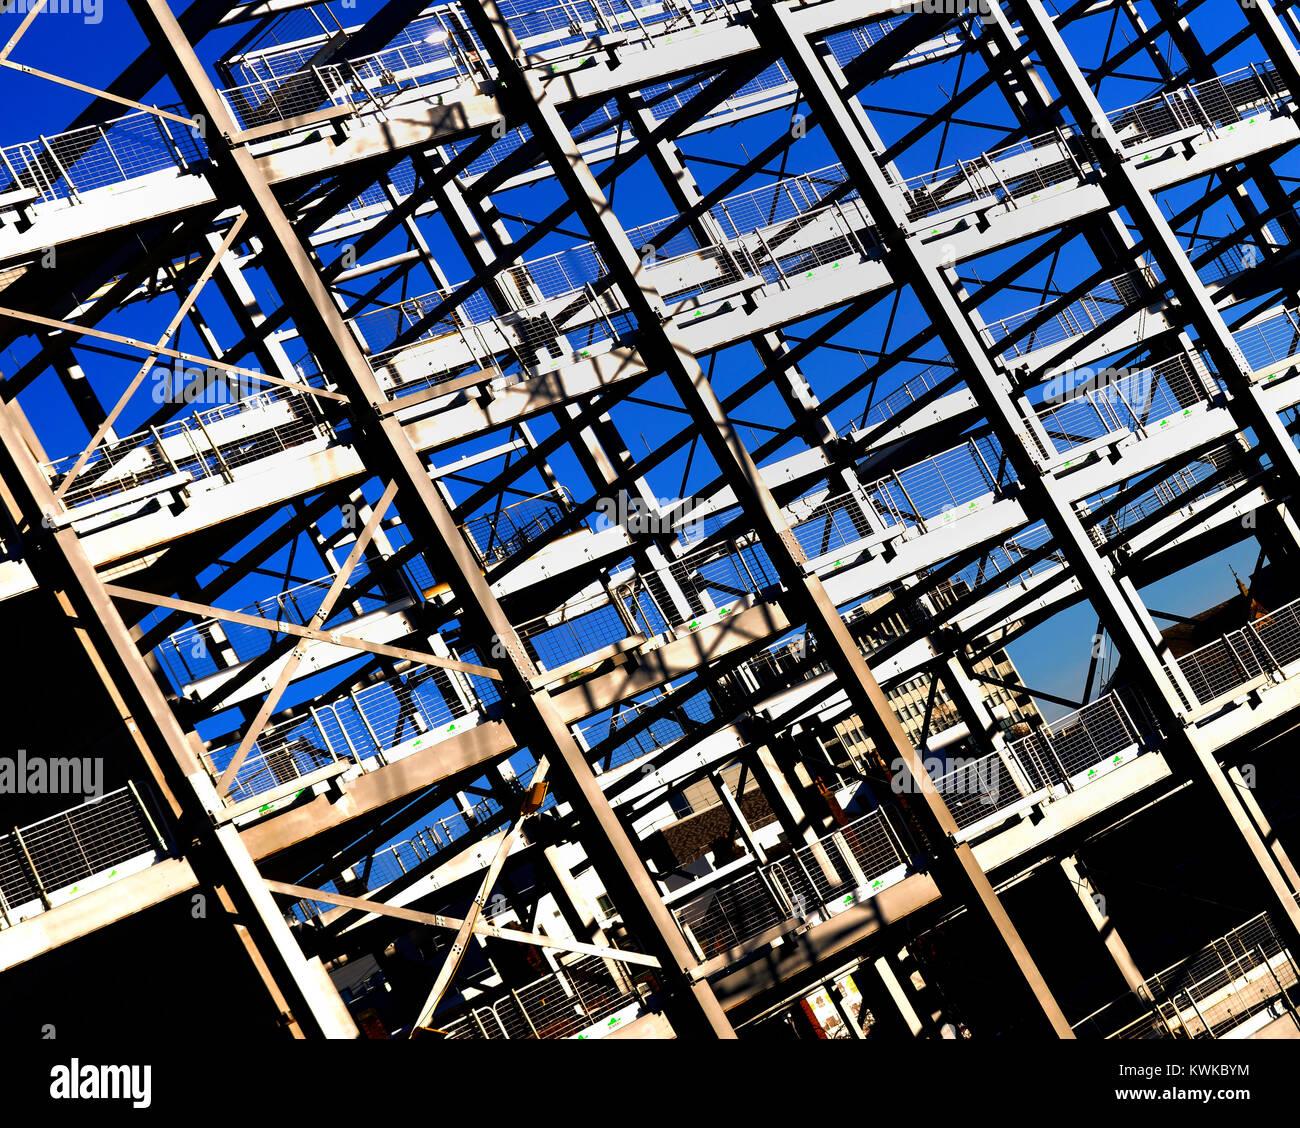 steelwork - Stock Image